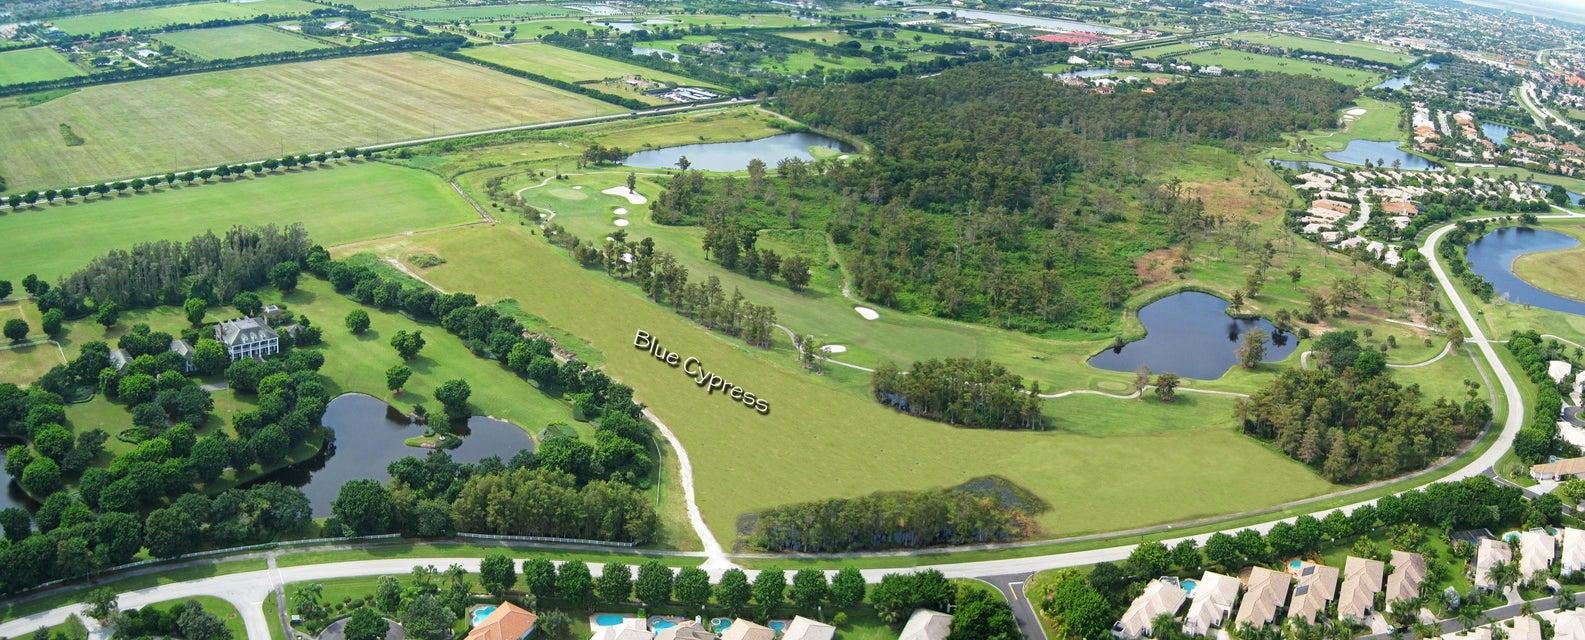 Single Family Home for Sale at 3192 Blue Cypress Lane 3192 Blue Cypress Lane Wellington, Florida 33414 United States